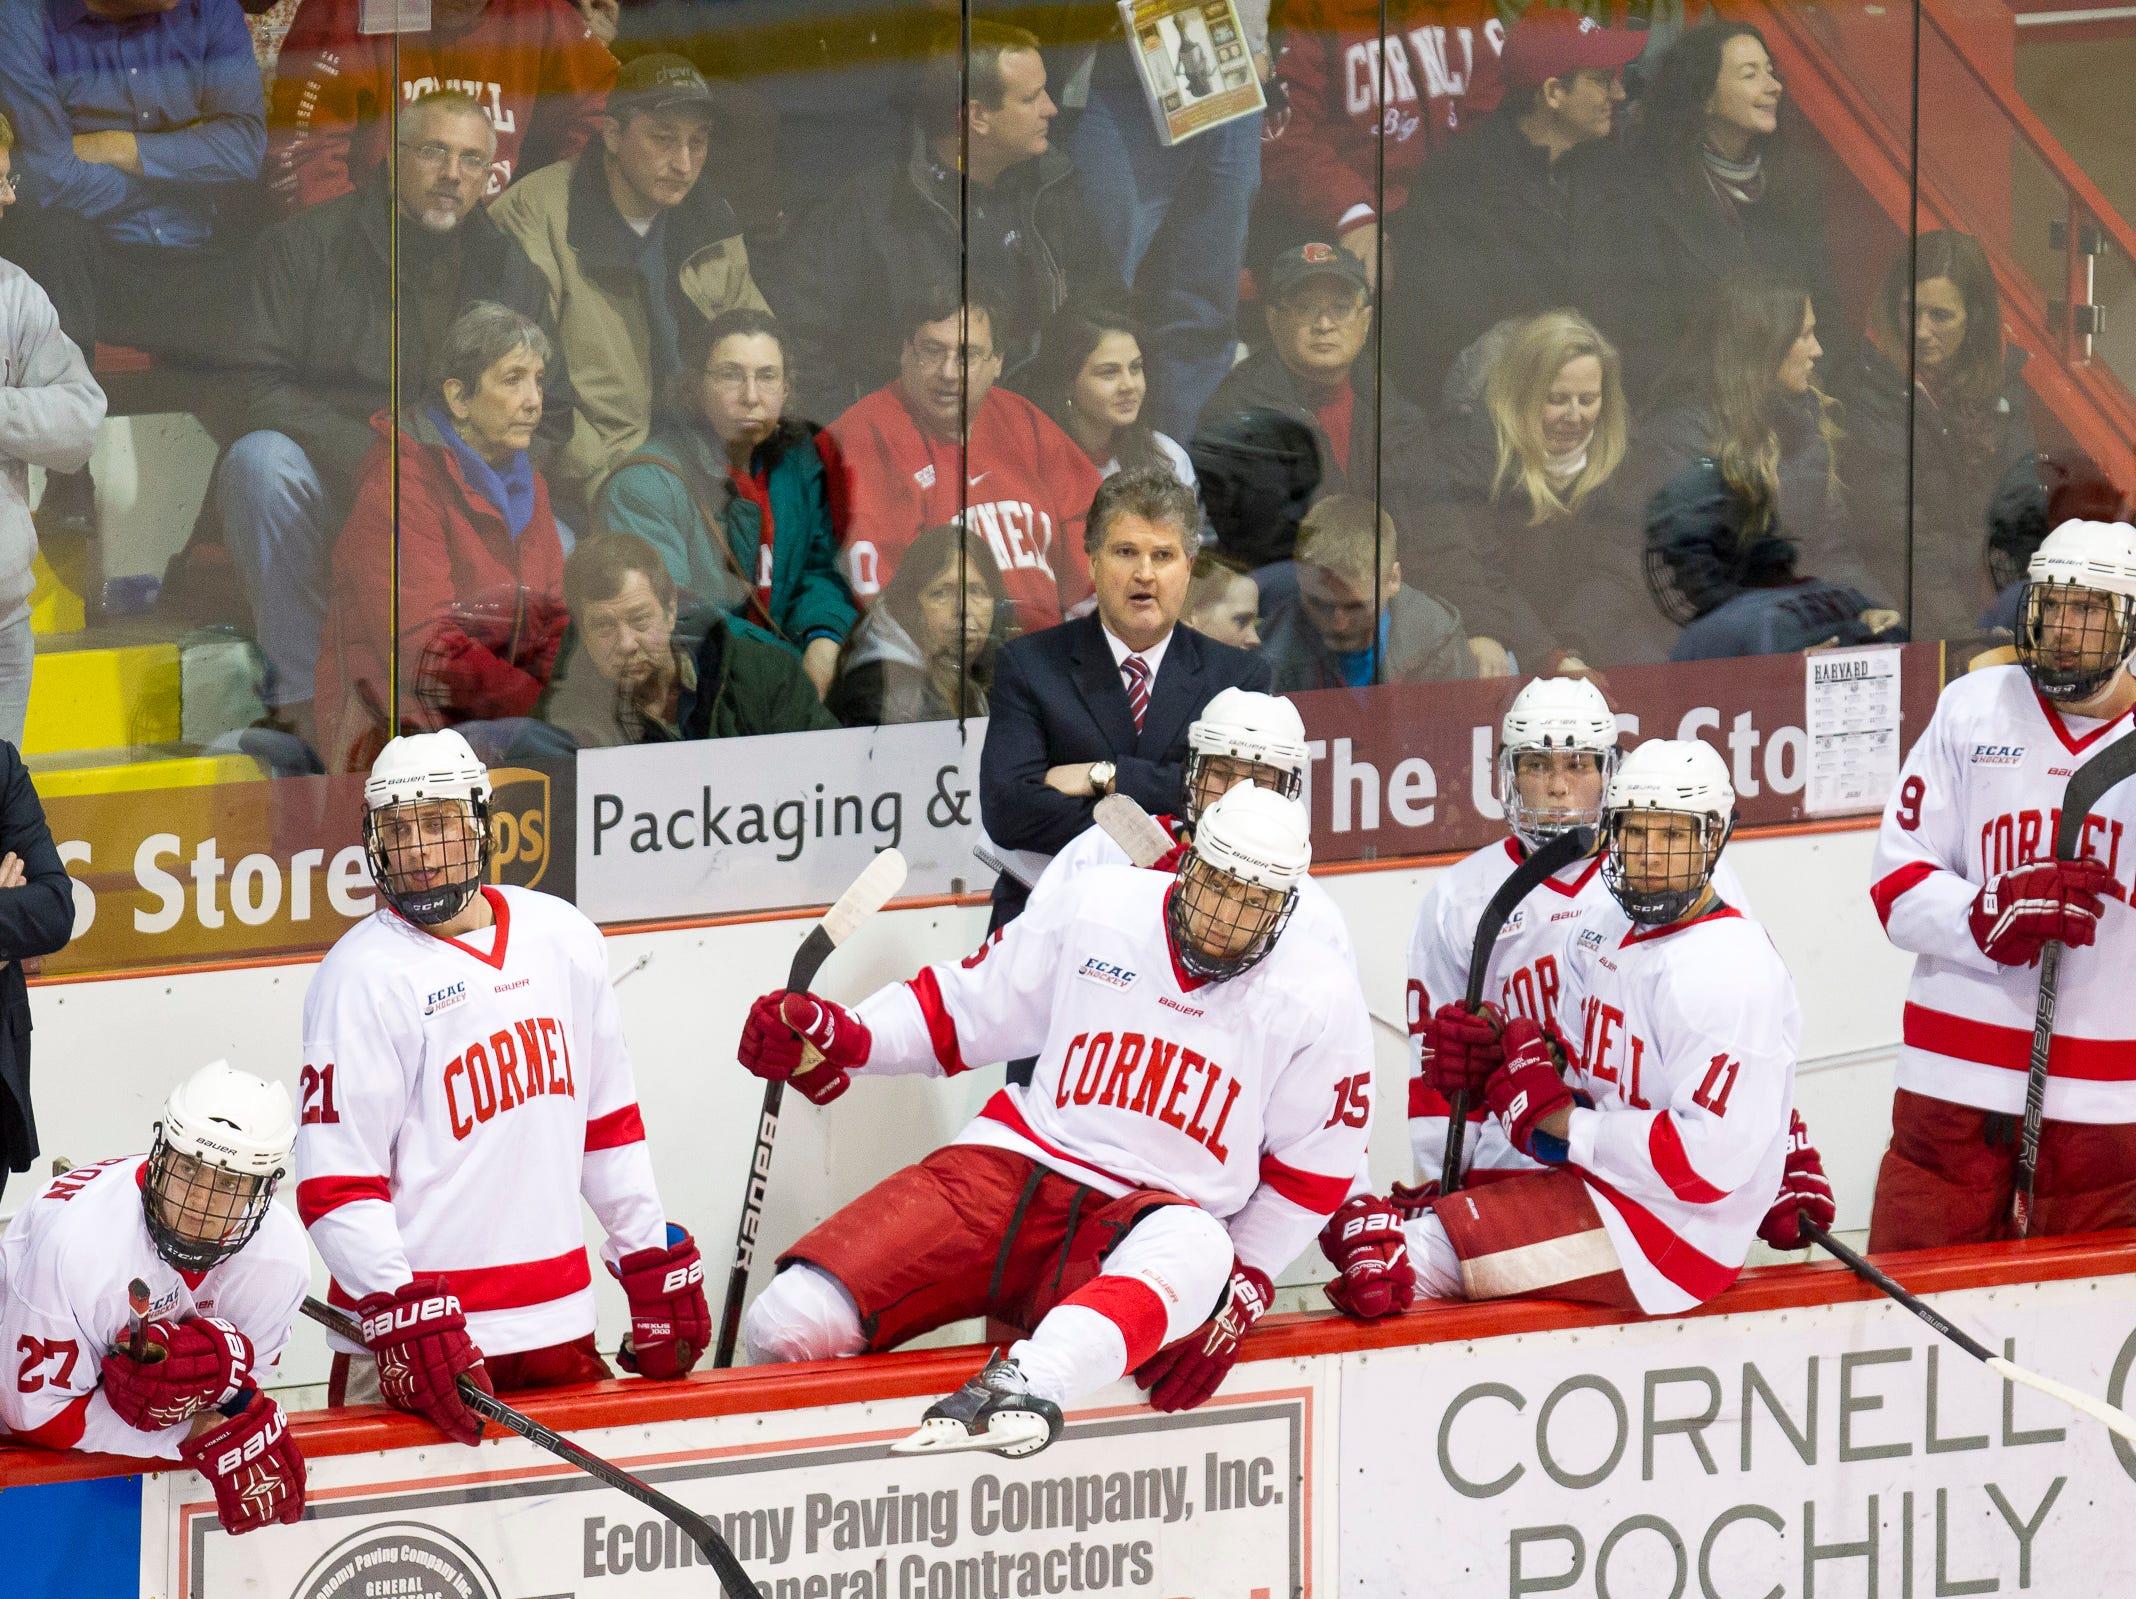 2014: Cornell Mens Hockey vs Harvard Saturday night at Lynah Rink. Cornell won 3-2 in overtime.